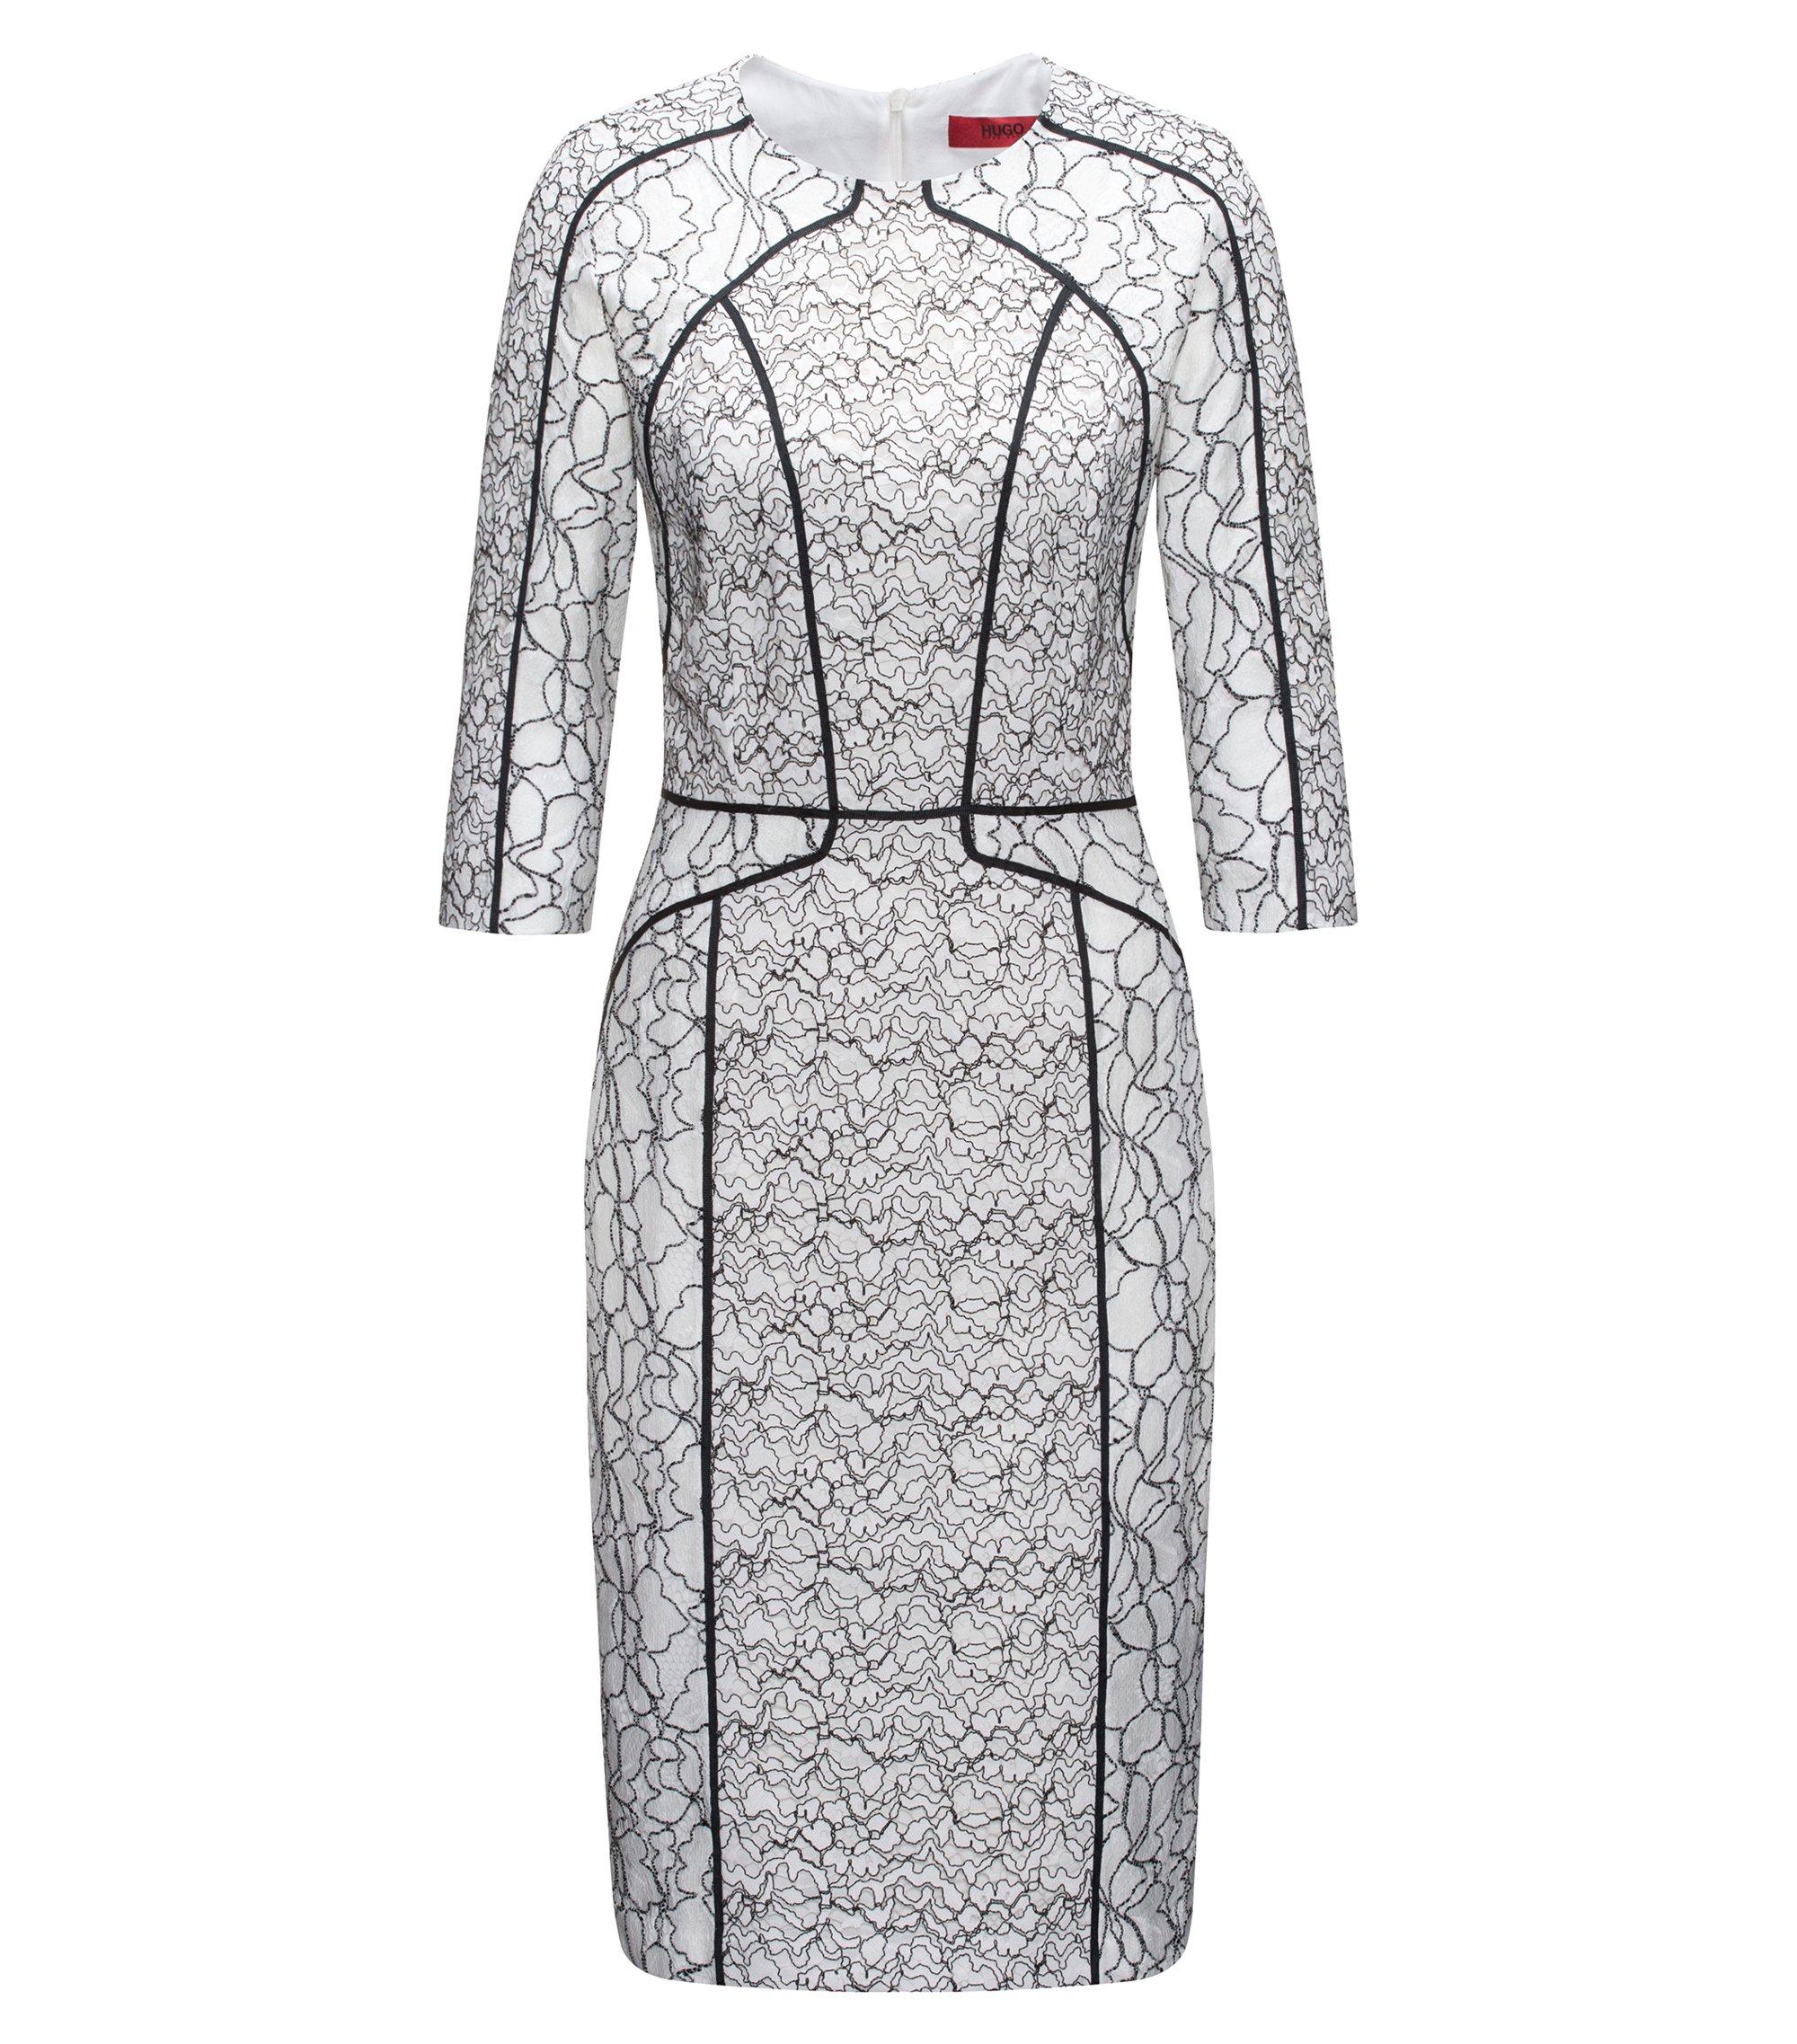 Patched Lace Dress | Karali, Patterned